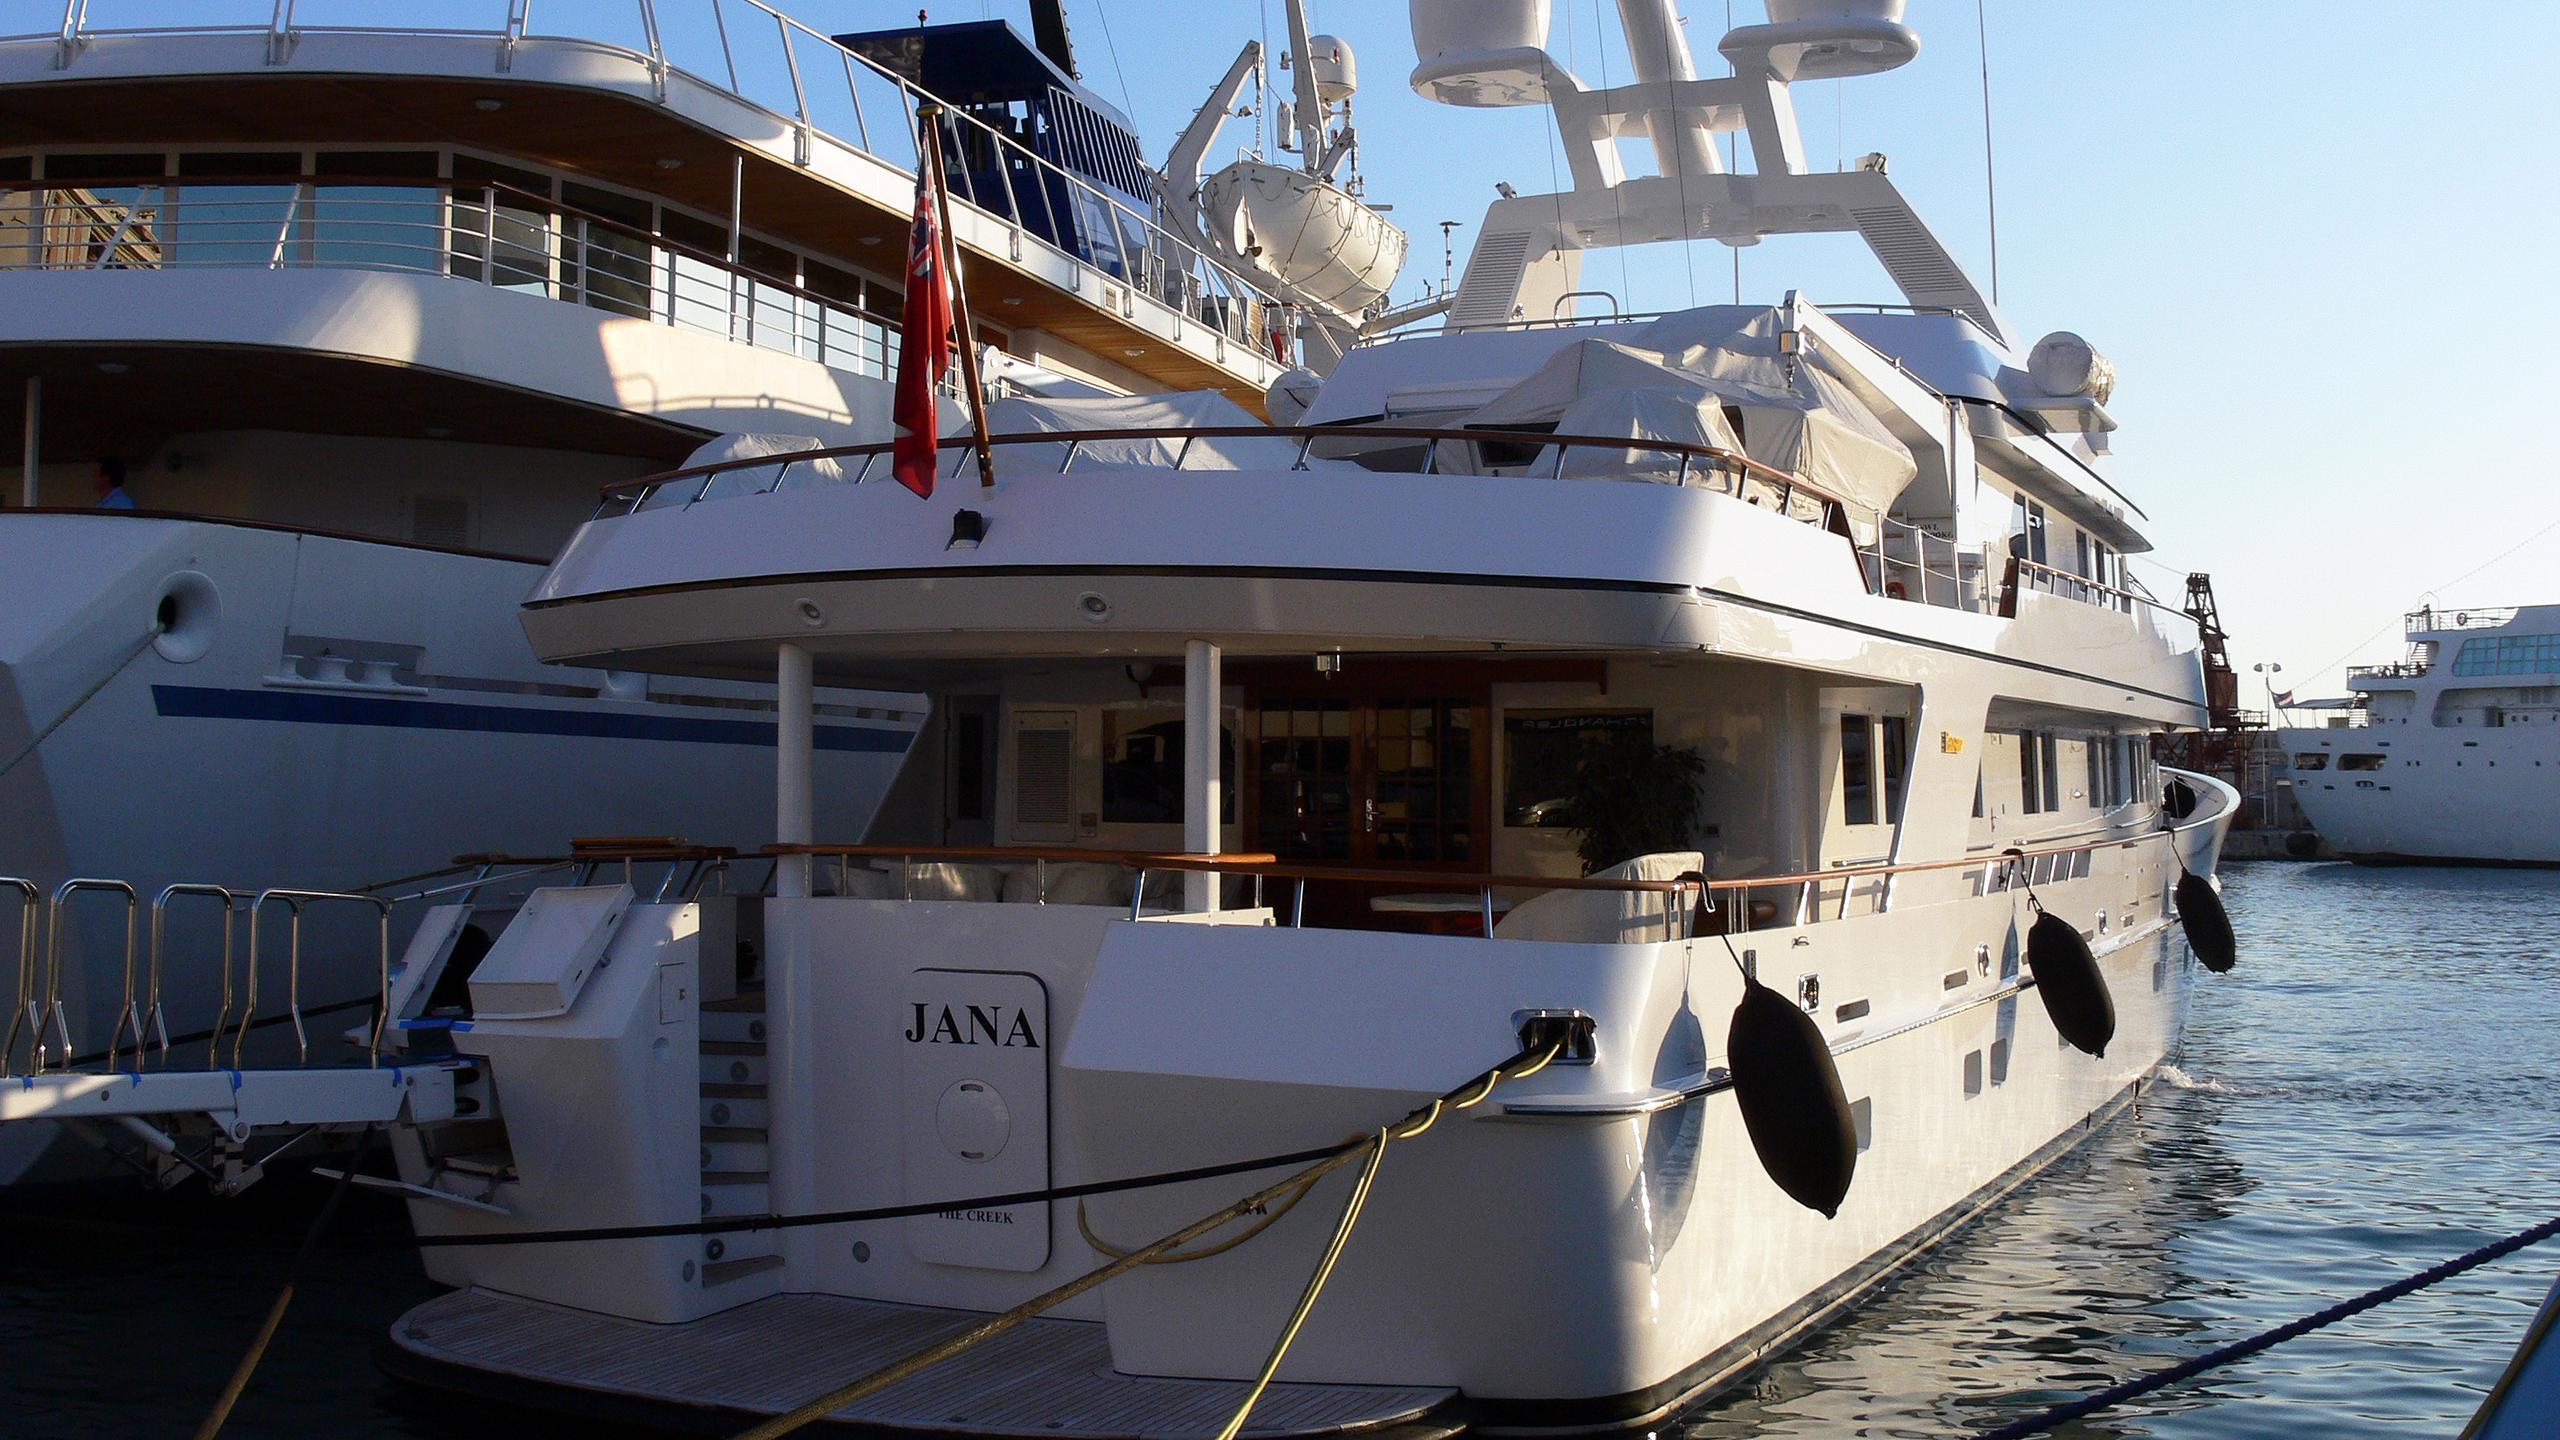 constance-motor-yacht-feadship-1986-46m-stern